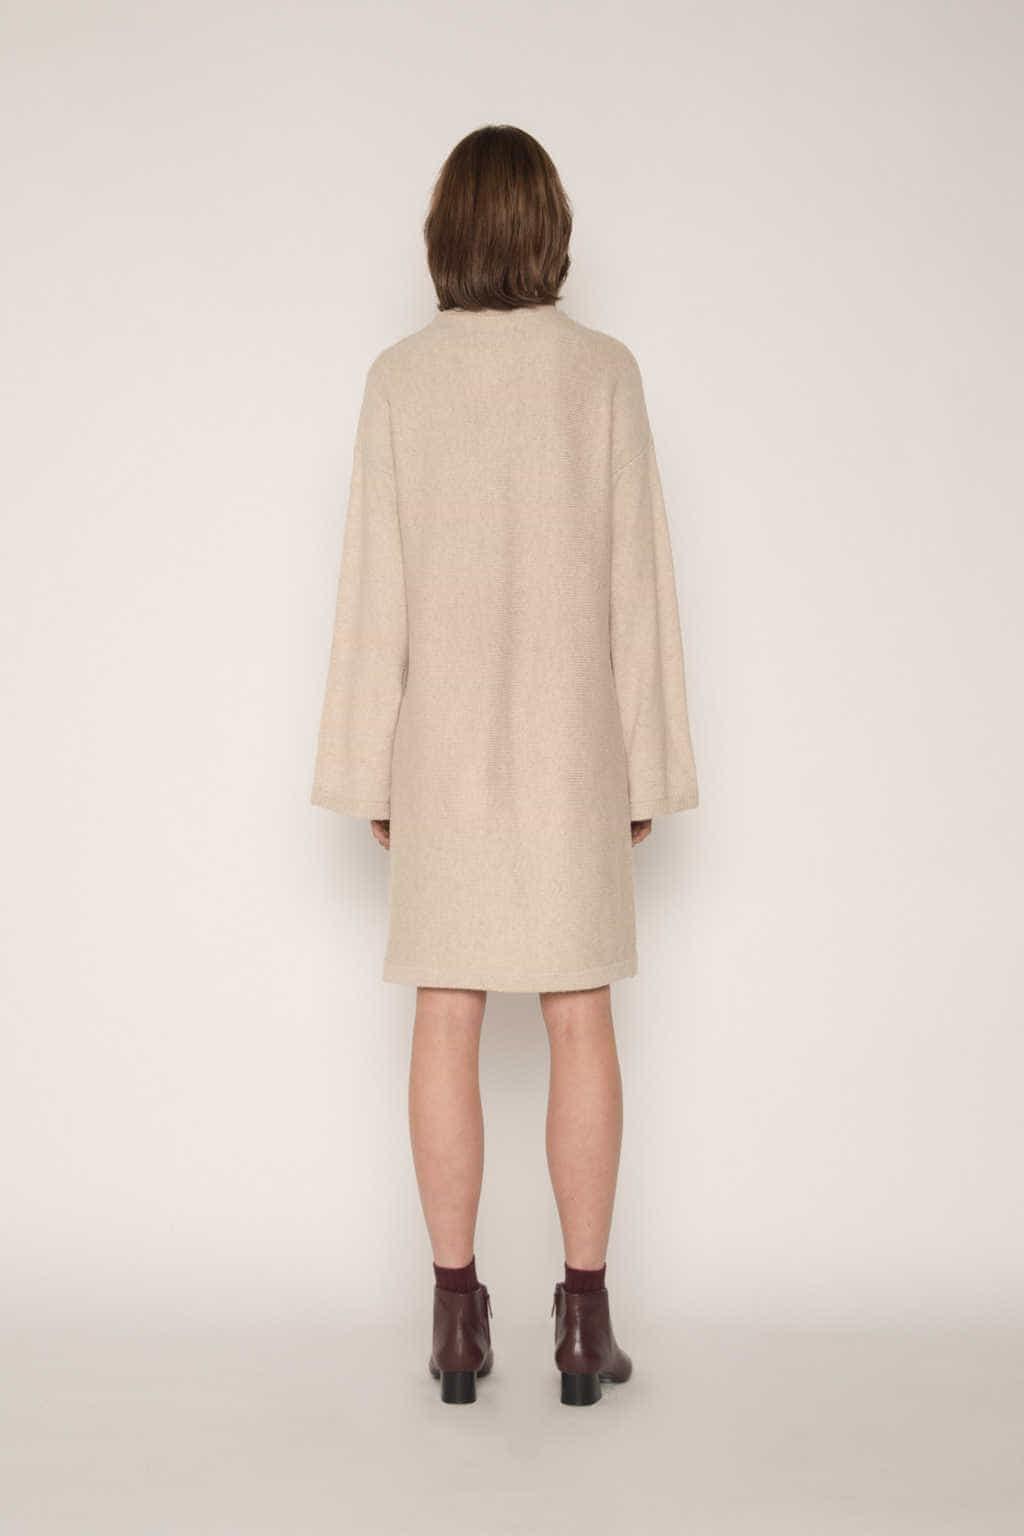 Dress 1817 Oatmeal 4